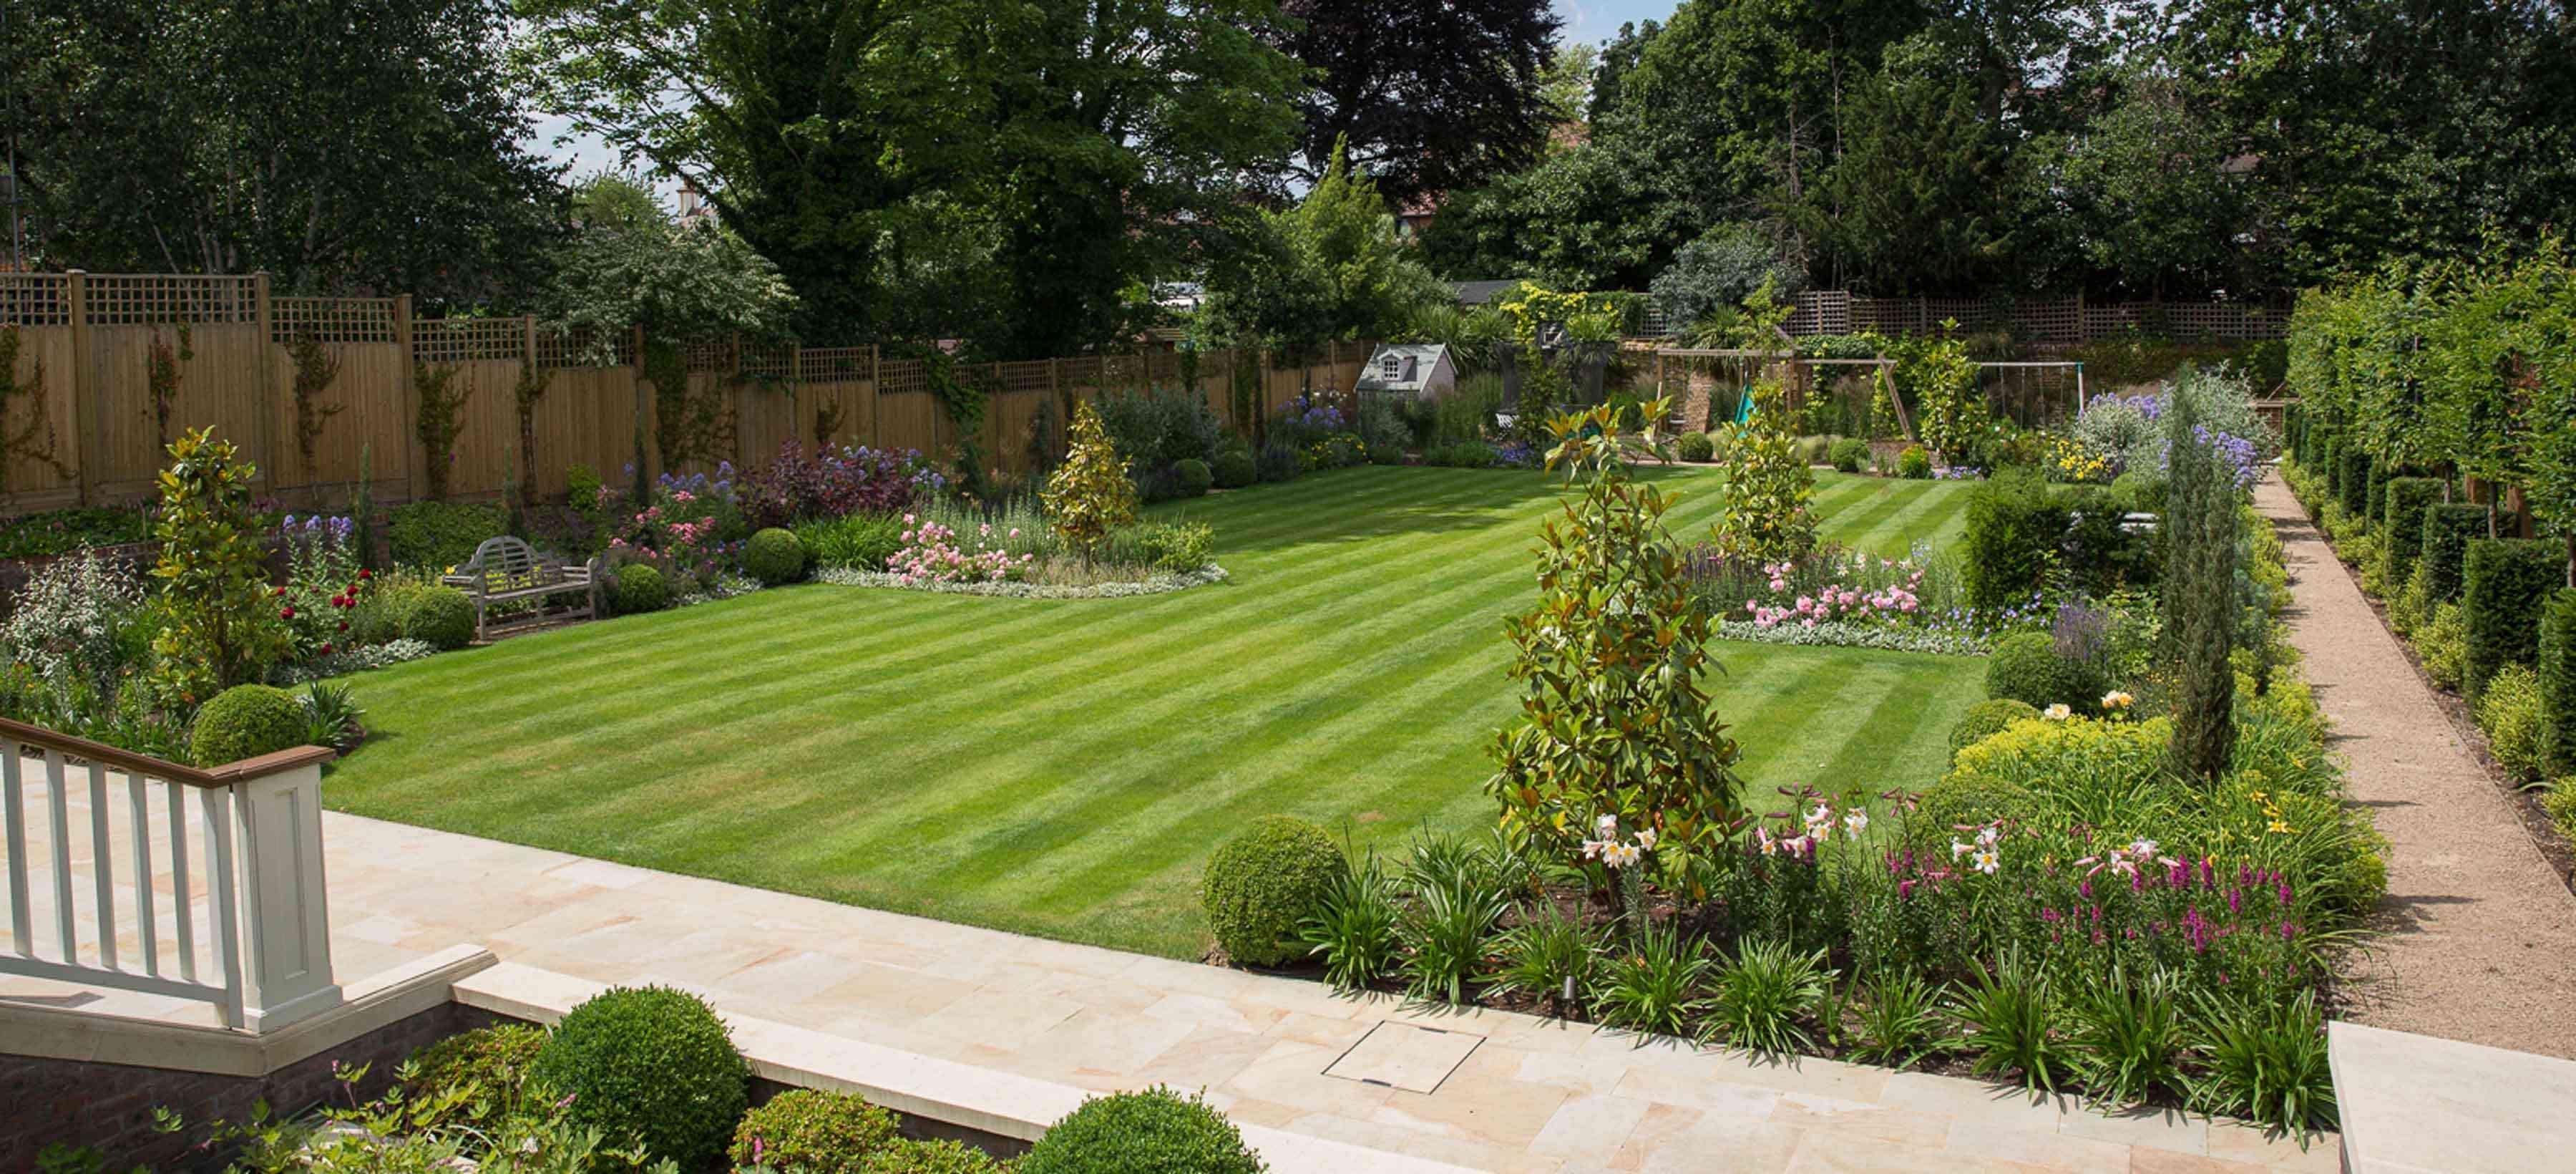 Wimbledon Large Luxury Garden - Belderbos on Big Backyard Landscaping Ideas id=16963